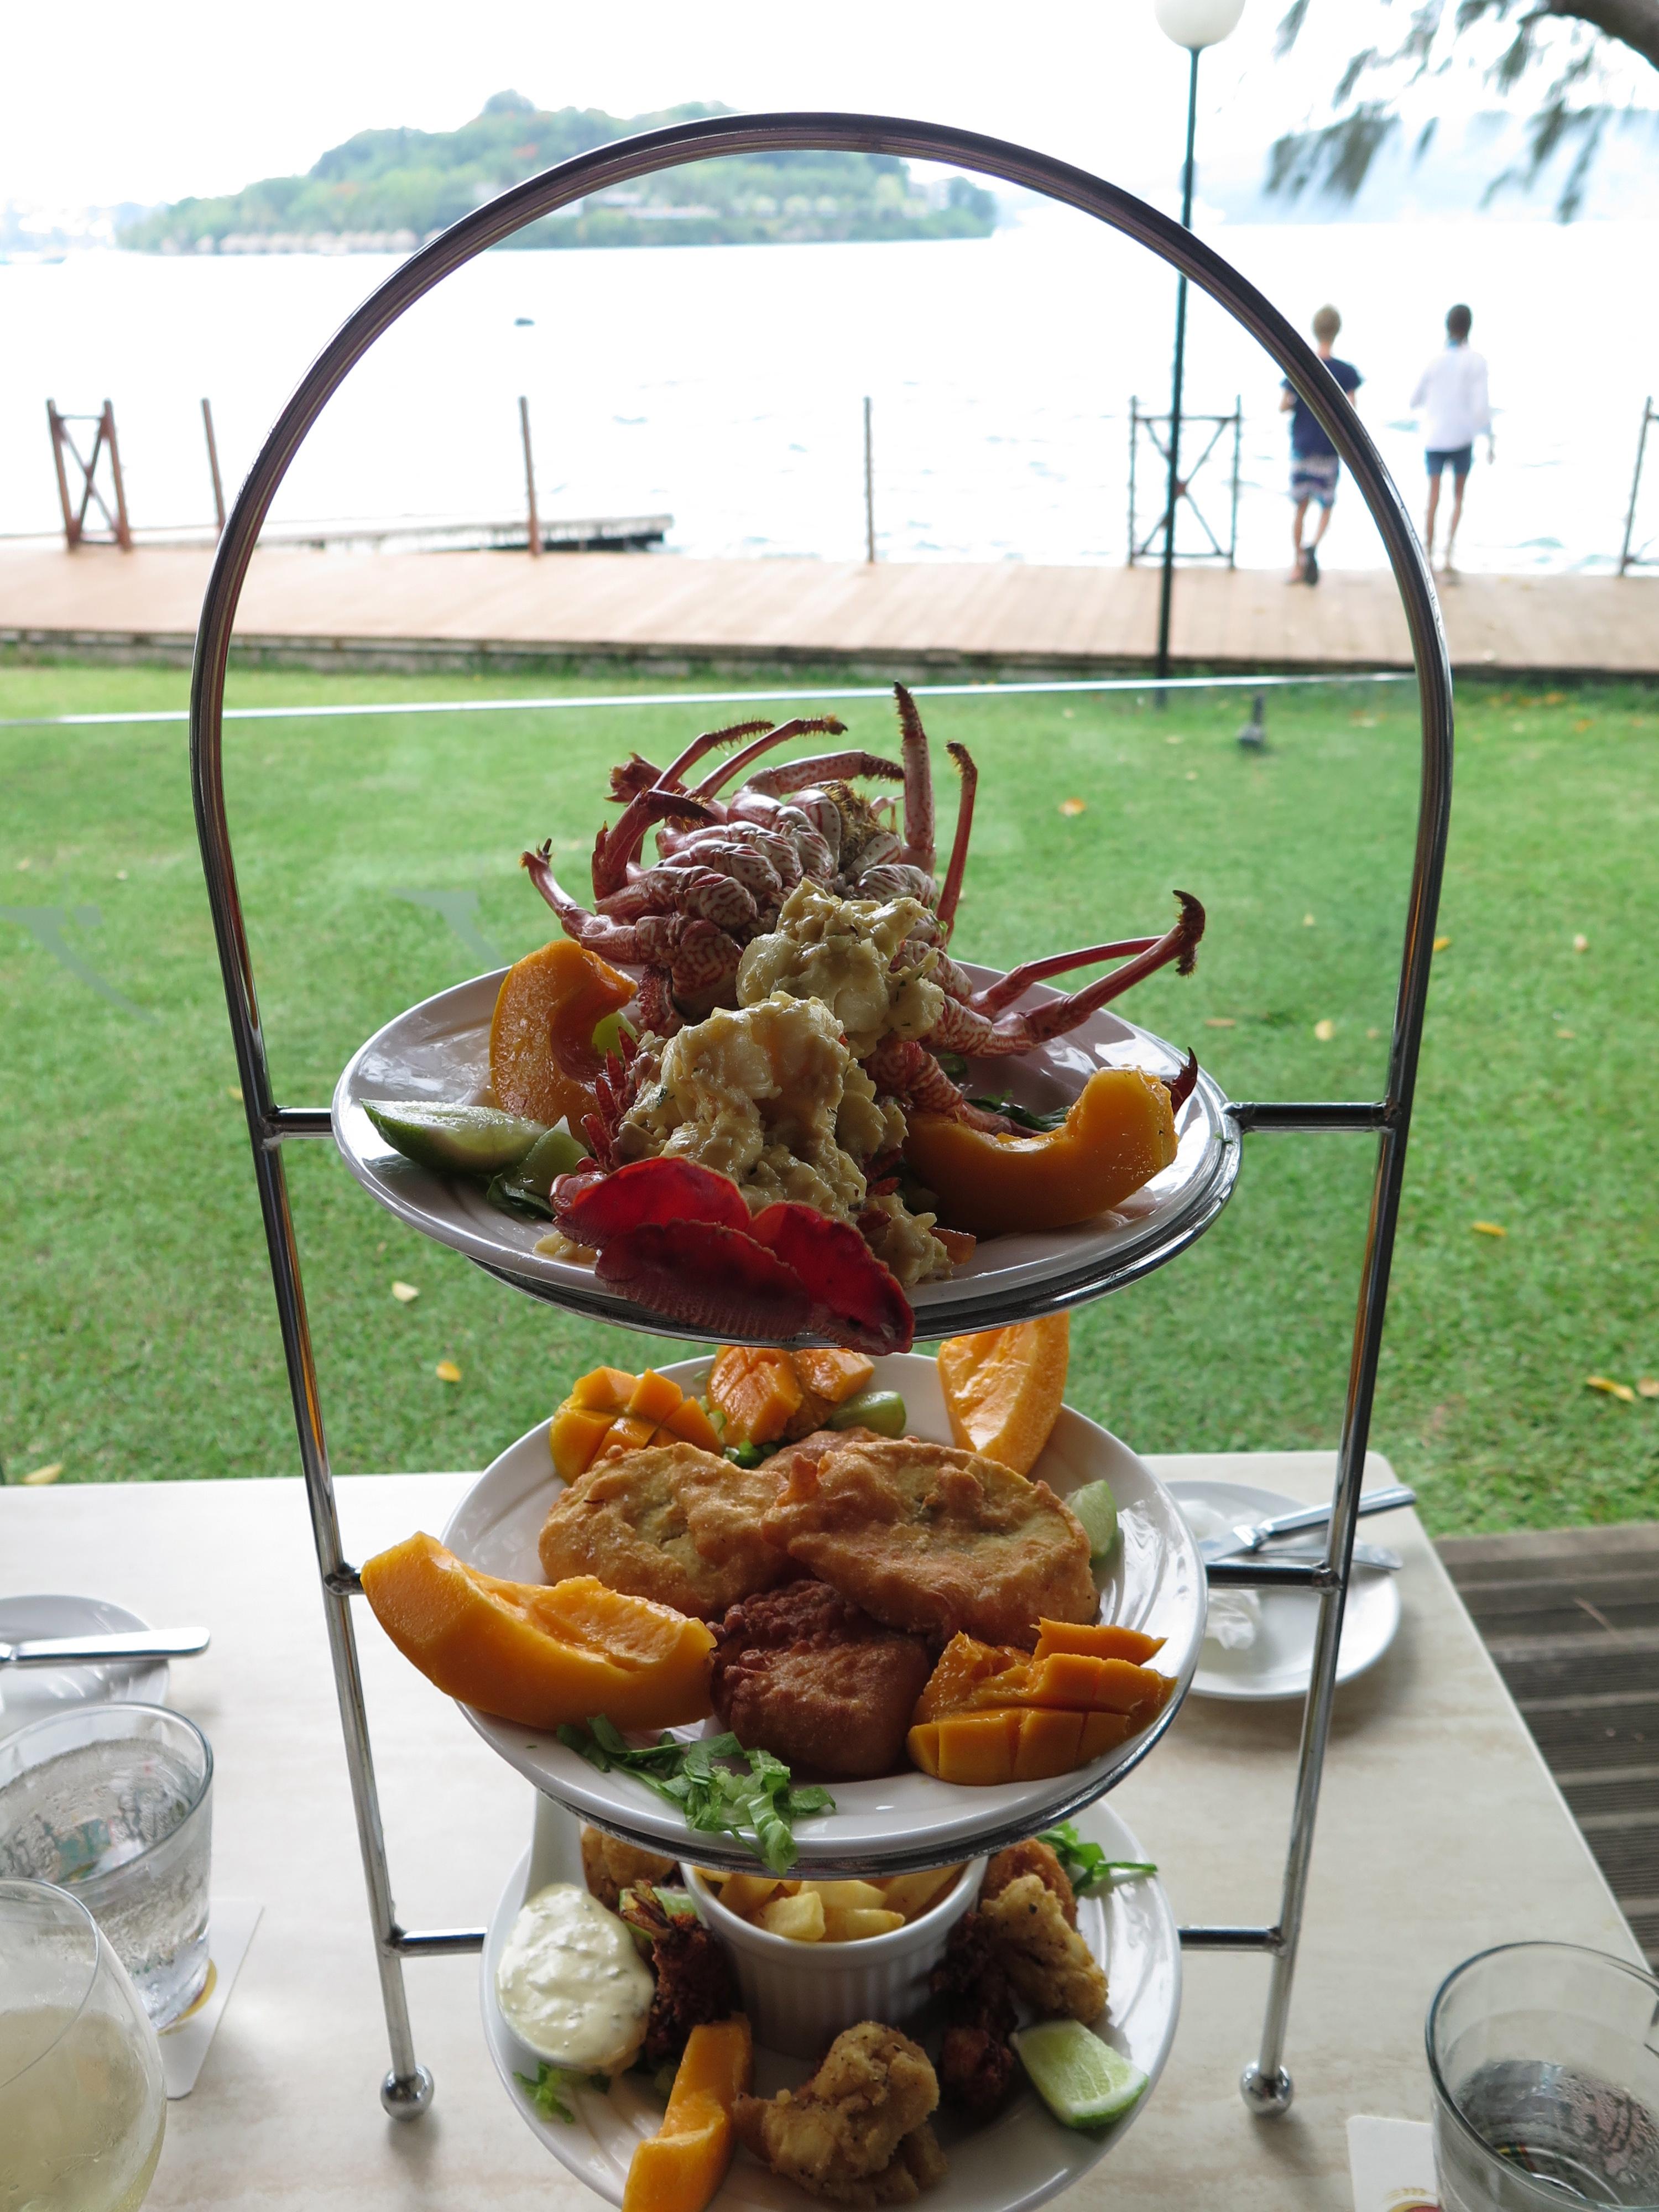 Massive fresh seafood platter in Vanuatu, Port Vila